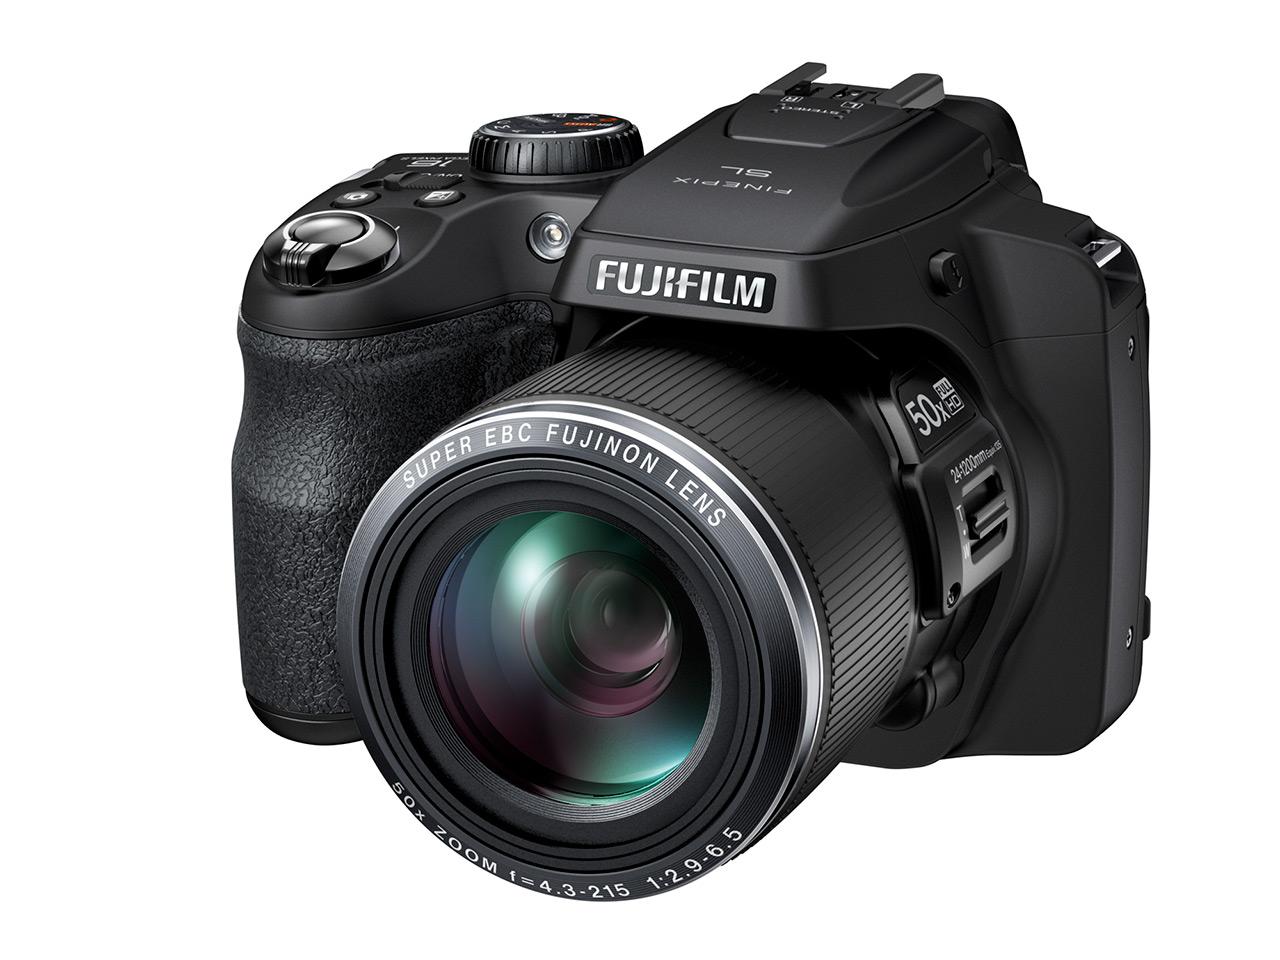 fujifilm introduces finepix sl1000 50x superzoom digital rh dpreview com Fujifilm FinePix S7000 Fujifilm FinePix Camera Manual